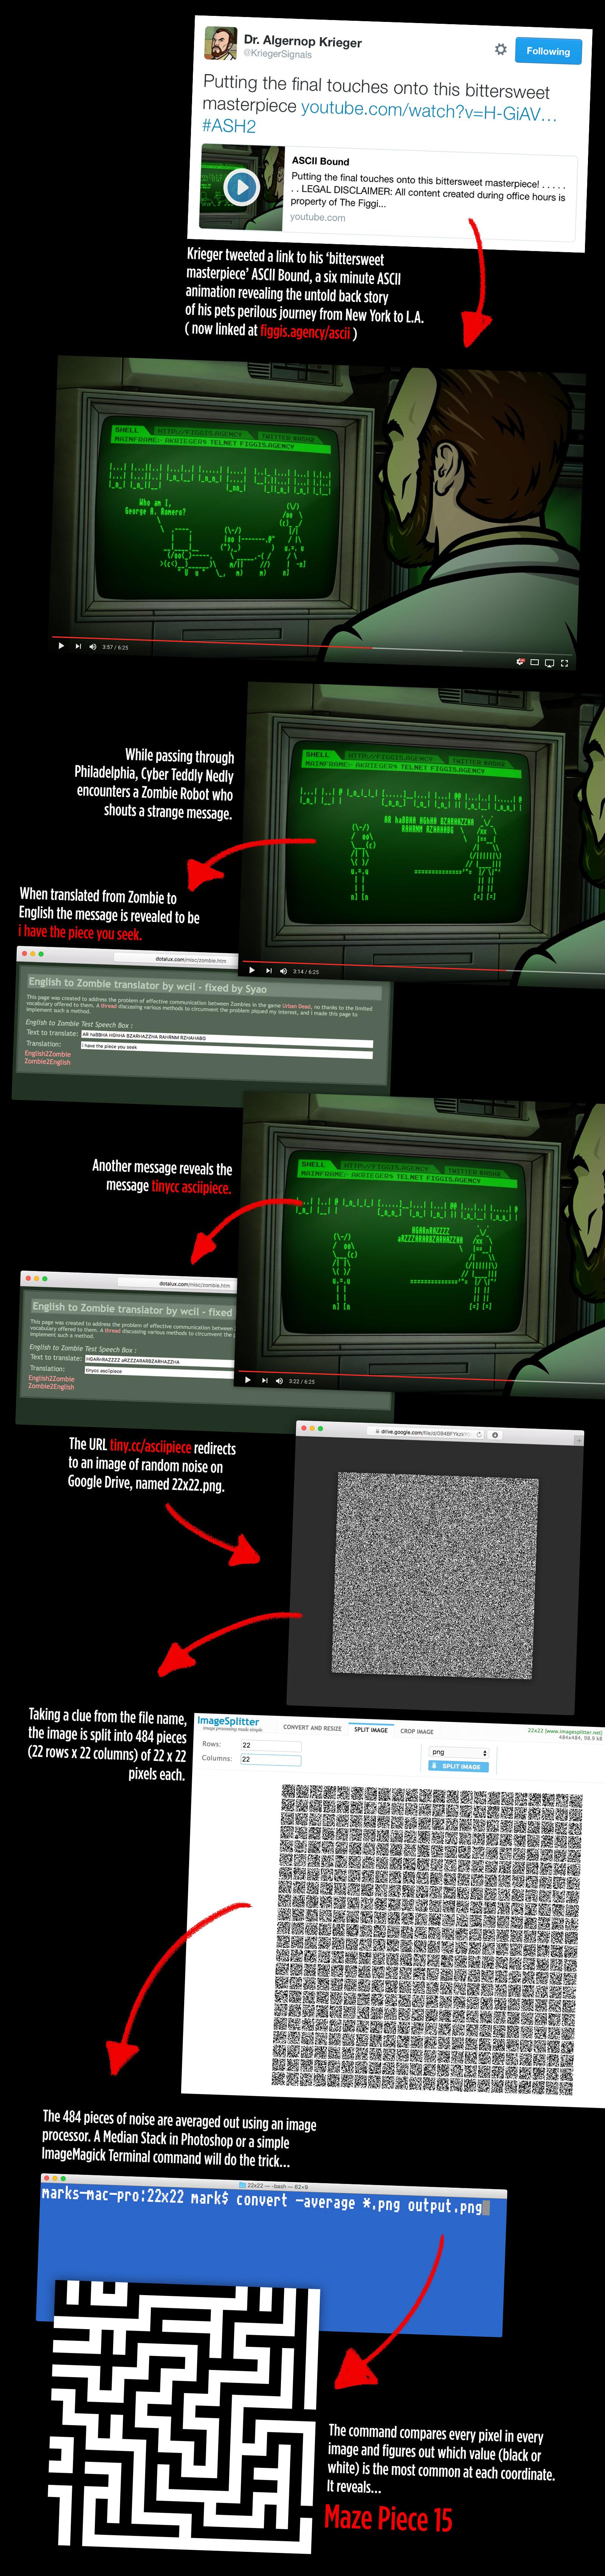 archer computer virus pirate ringtone